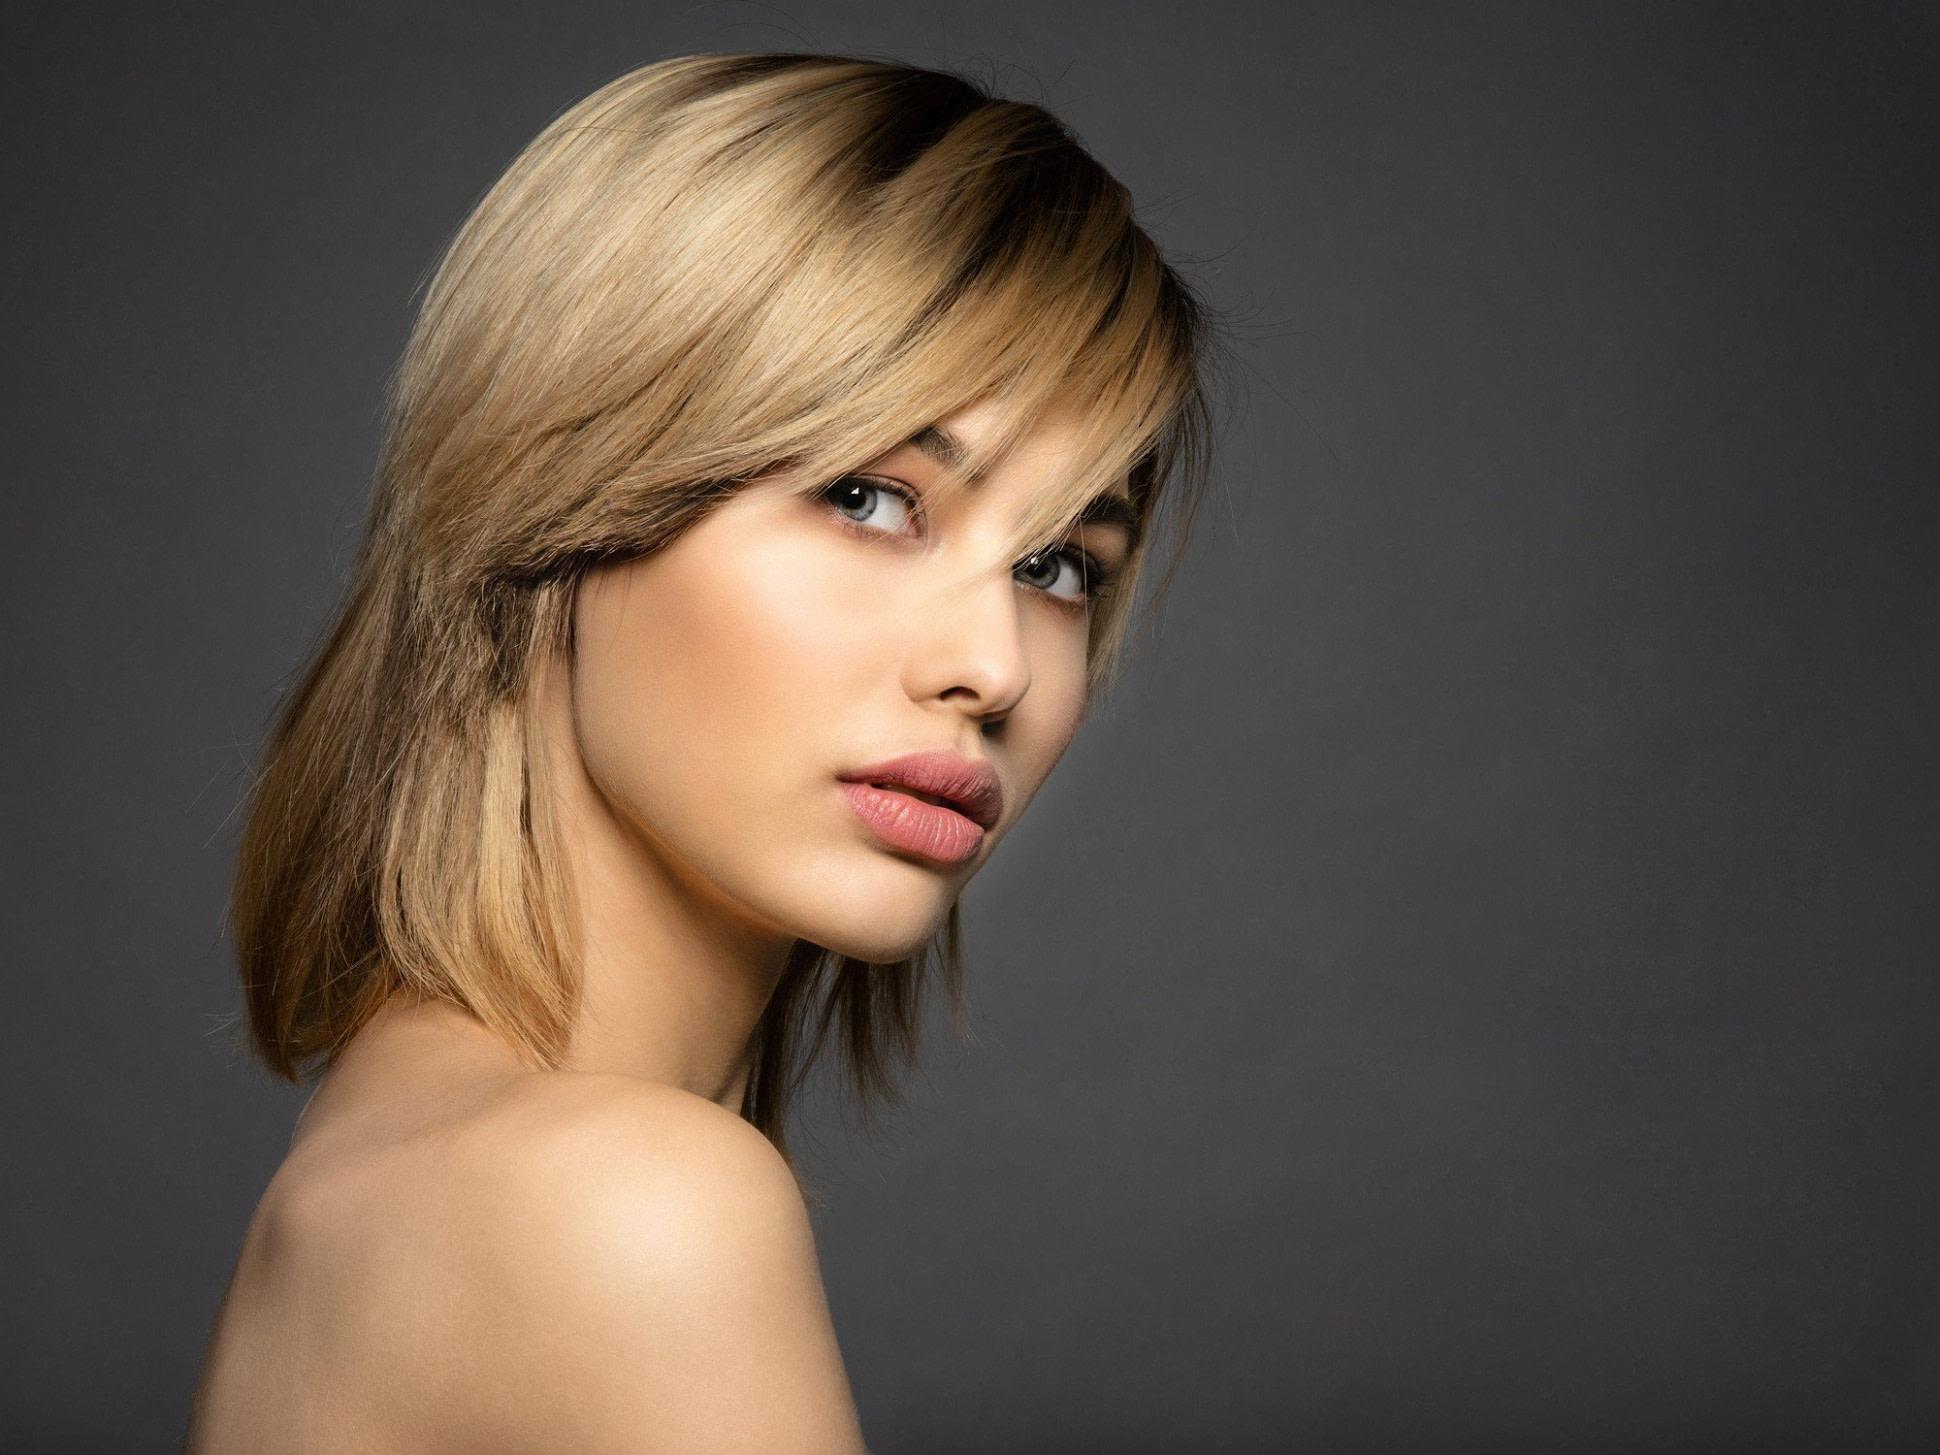 Die schönsten Kurzhaar-Frisuren 12